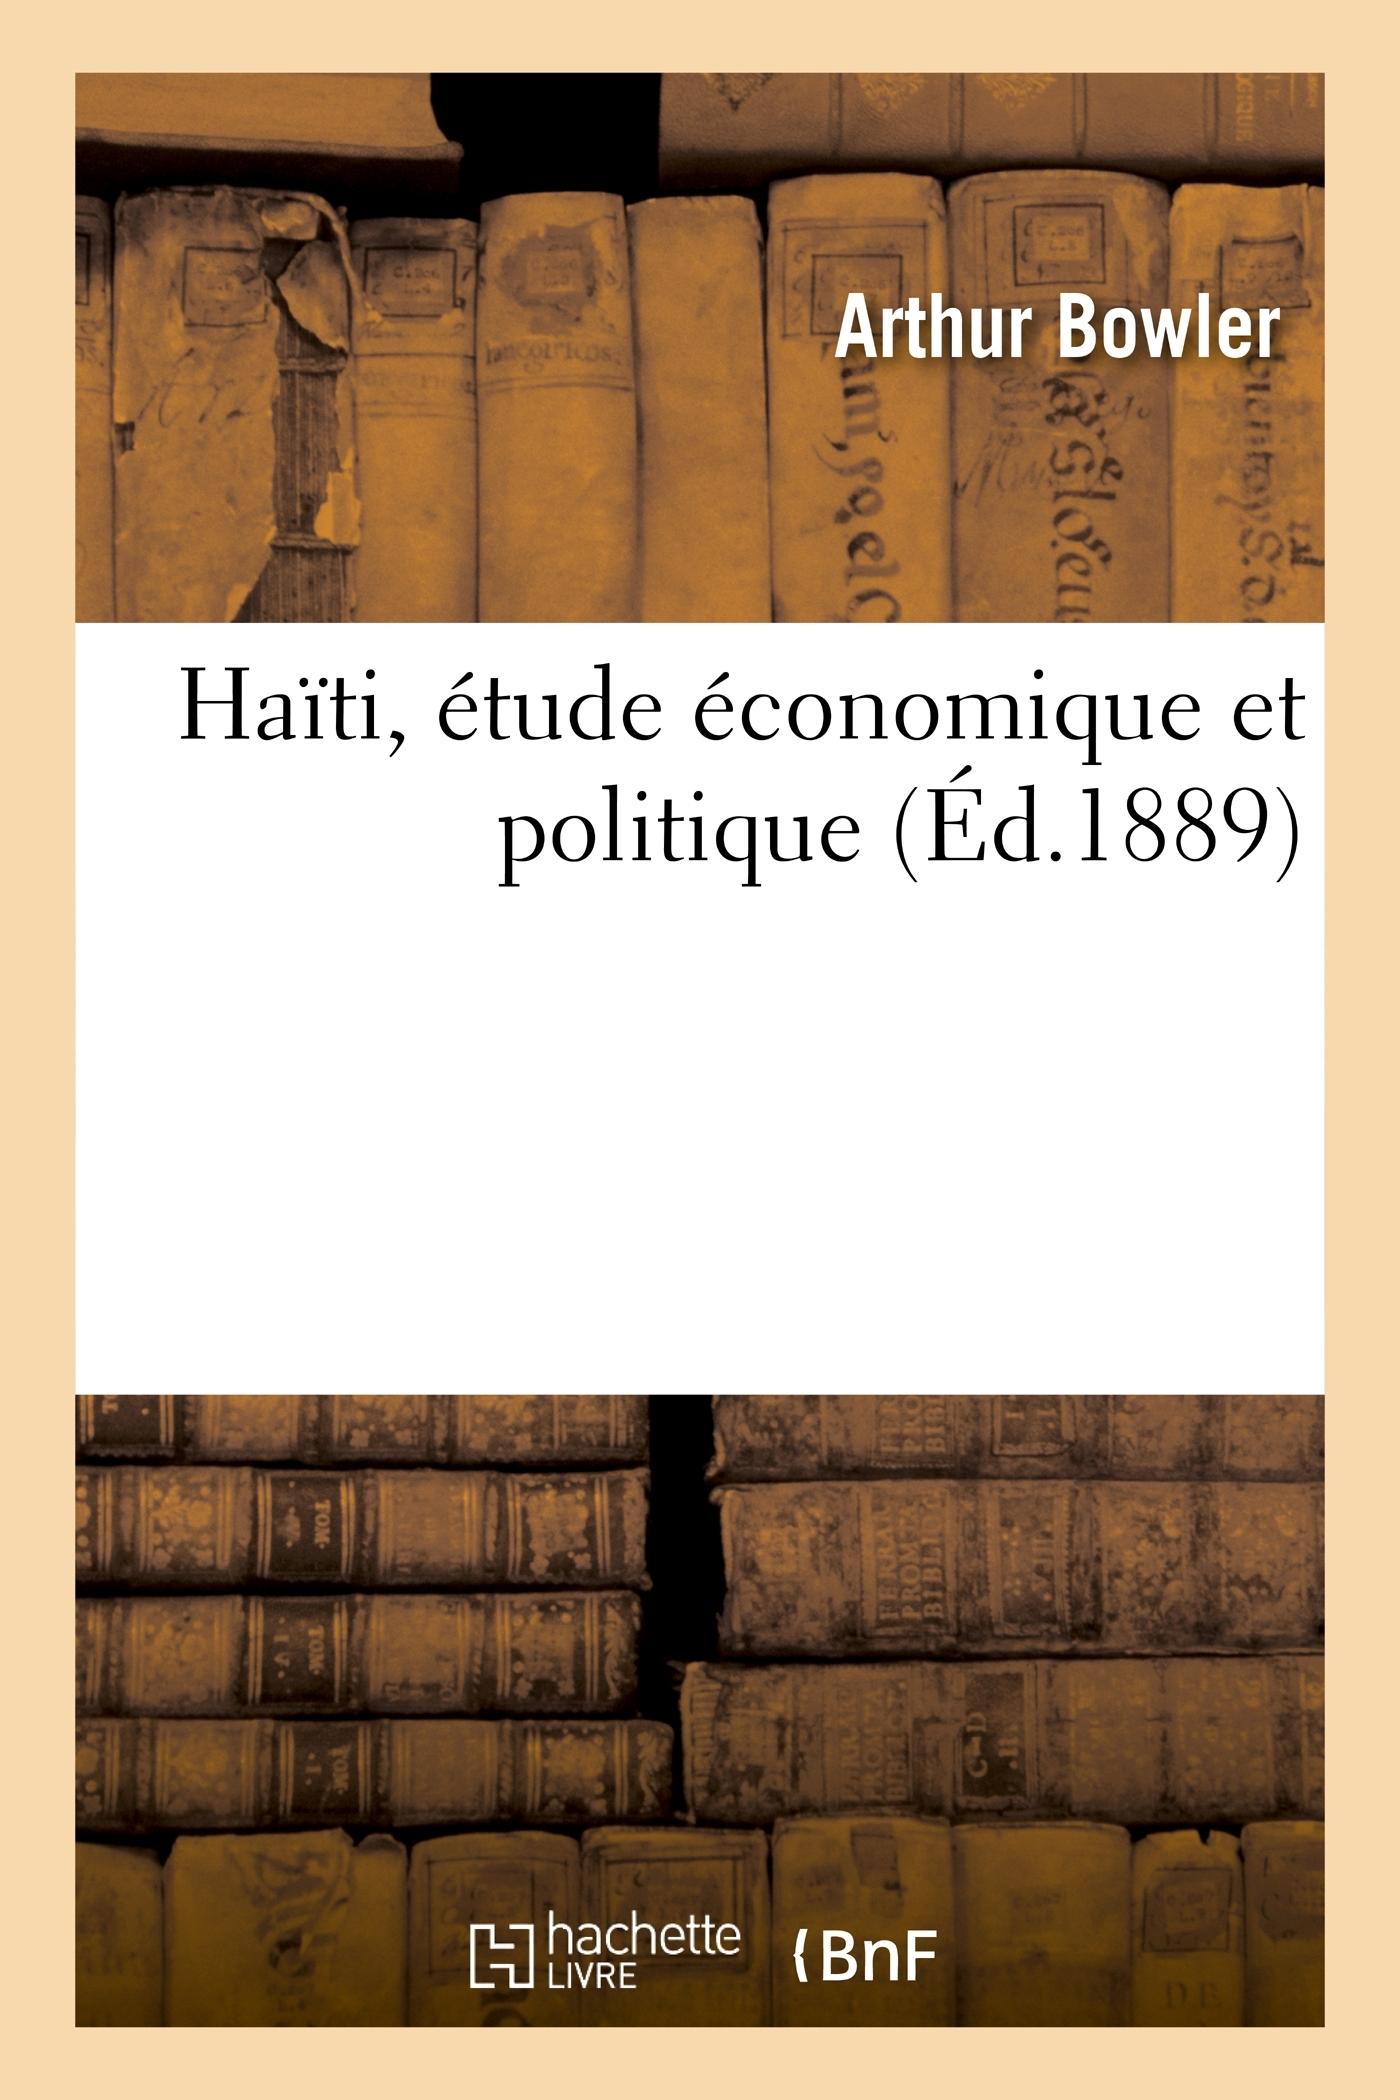 HAITI, ETUDE ECONOMIQUE ET POLITIQUE